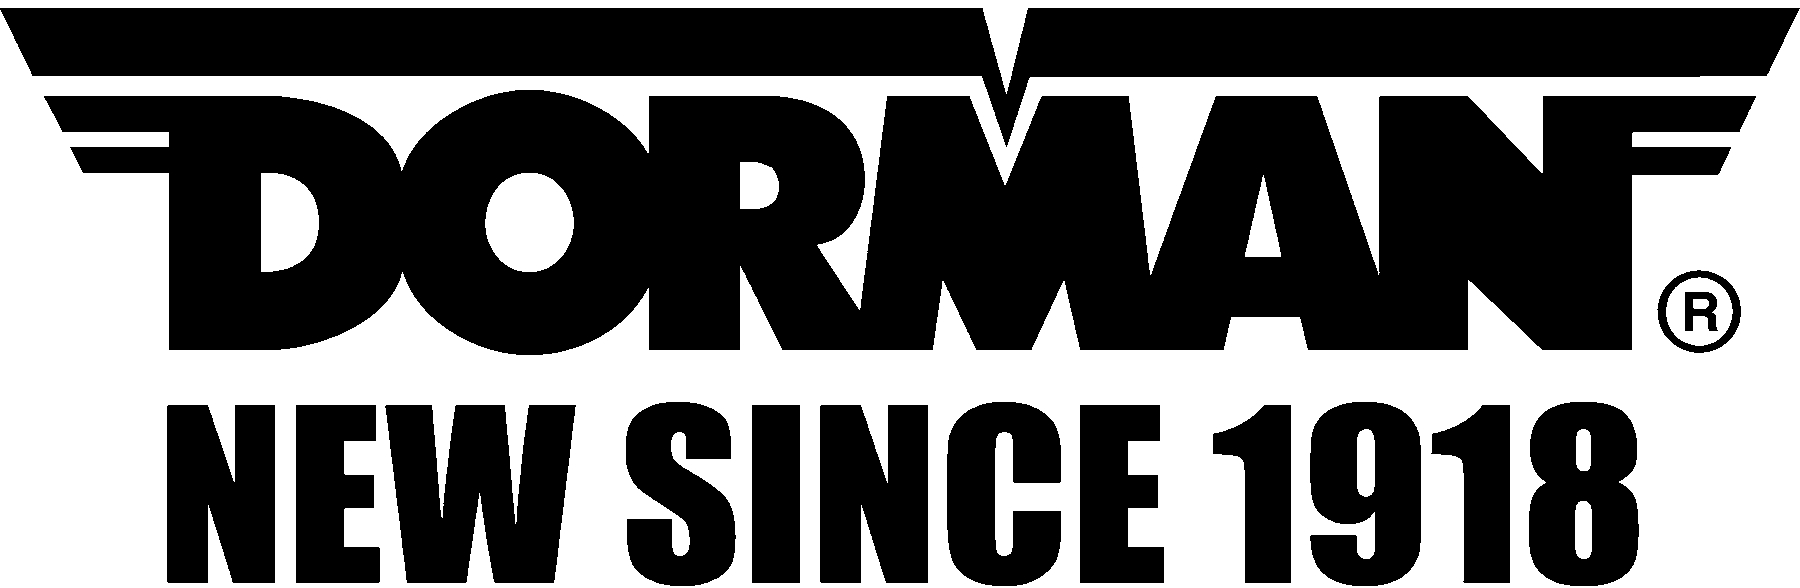 Dorman_logo.jpg